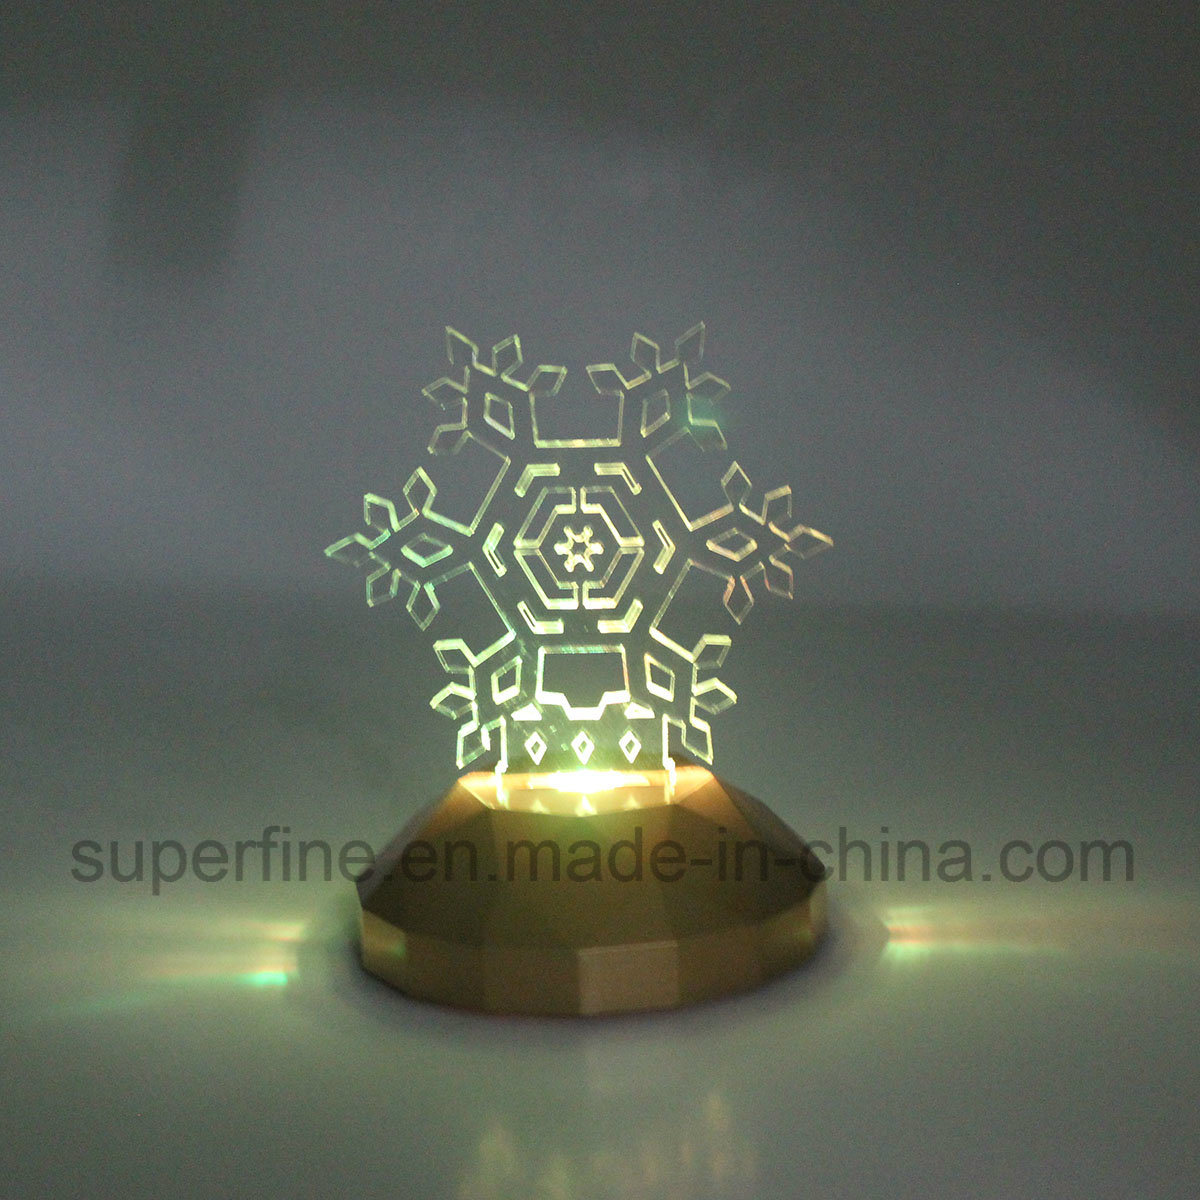 Newest Plastic Romantic Customized Multicolor Indoor Using Party Luminary Snowflake Acrylic LED Light